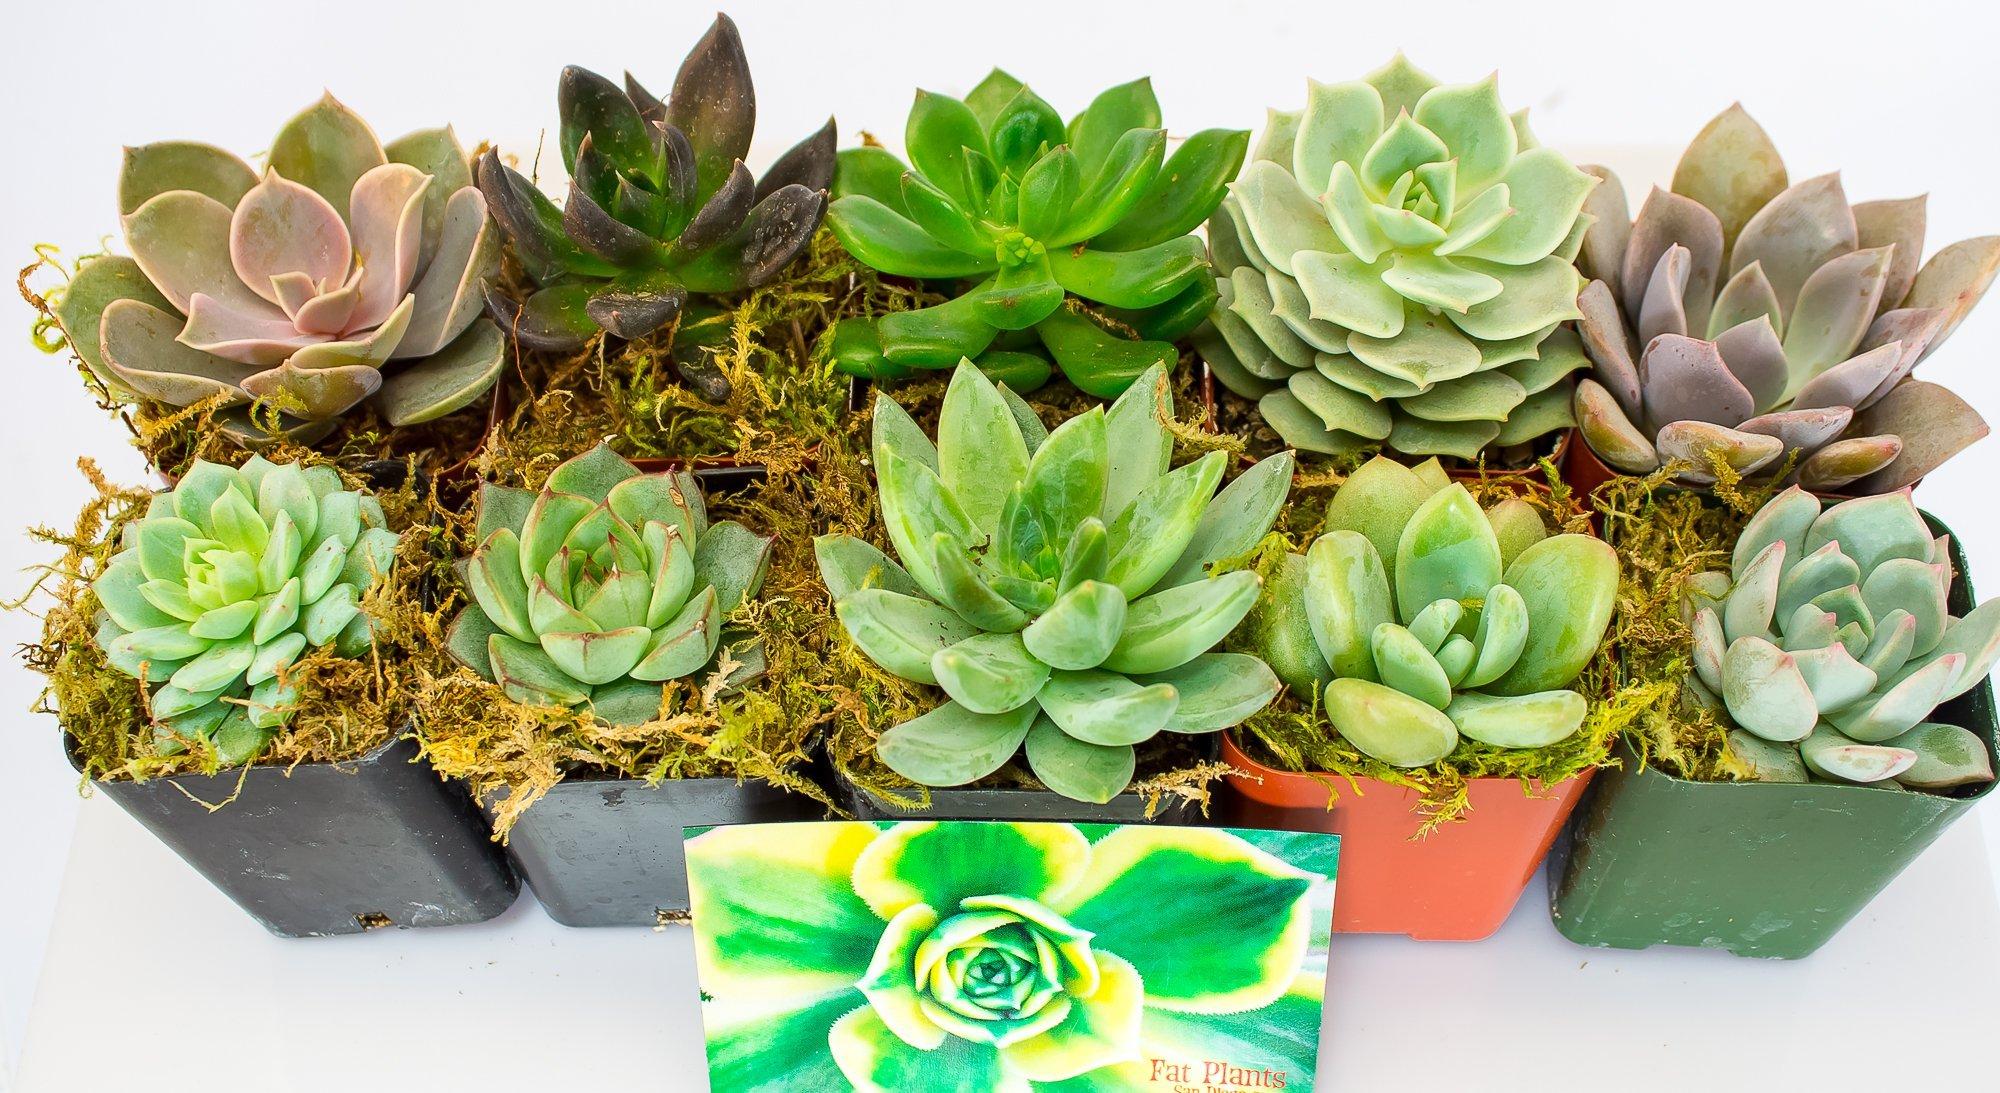 Fat Plants San Diego All Rosette Succulent Plants in 2 Inch Pots (10)